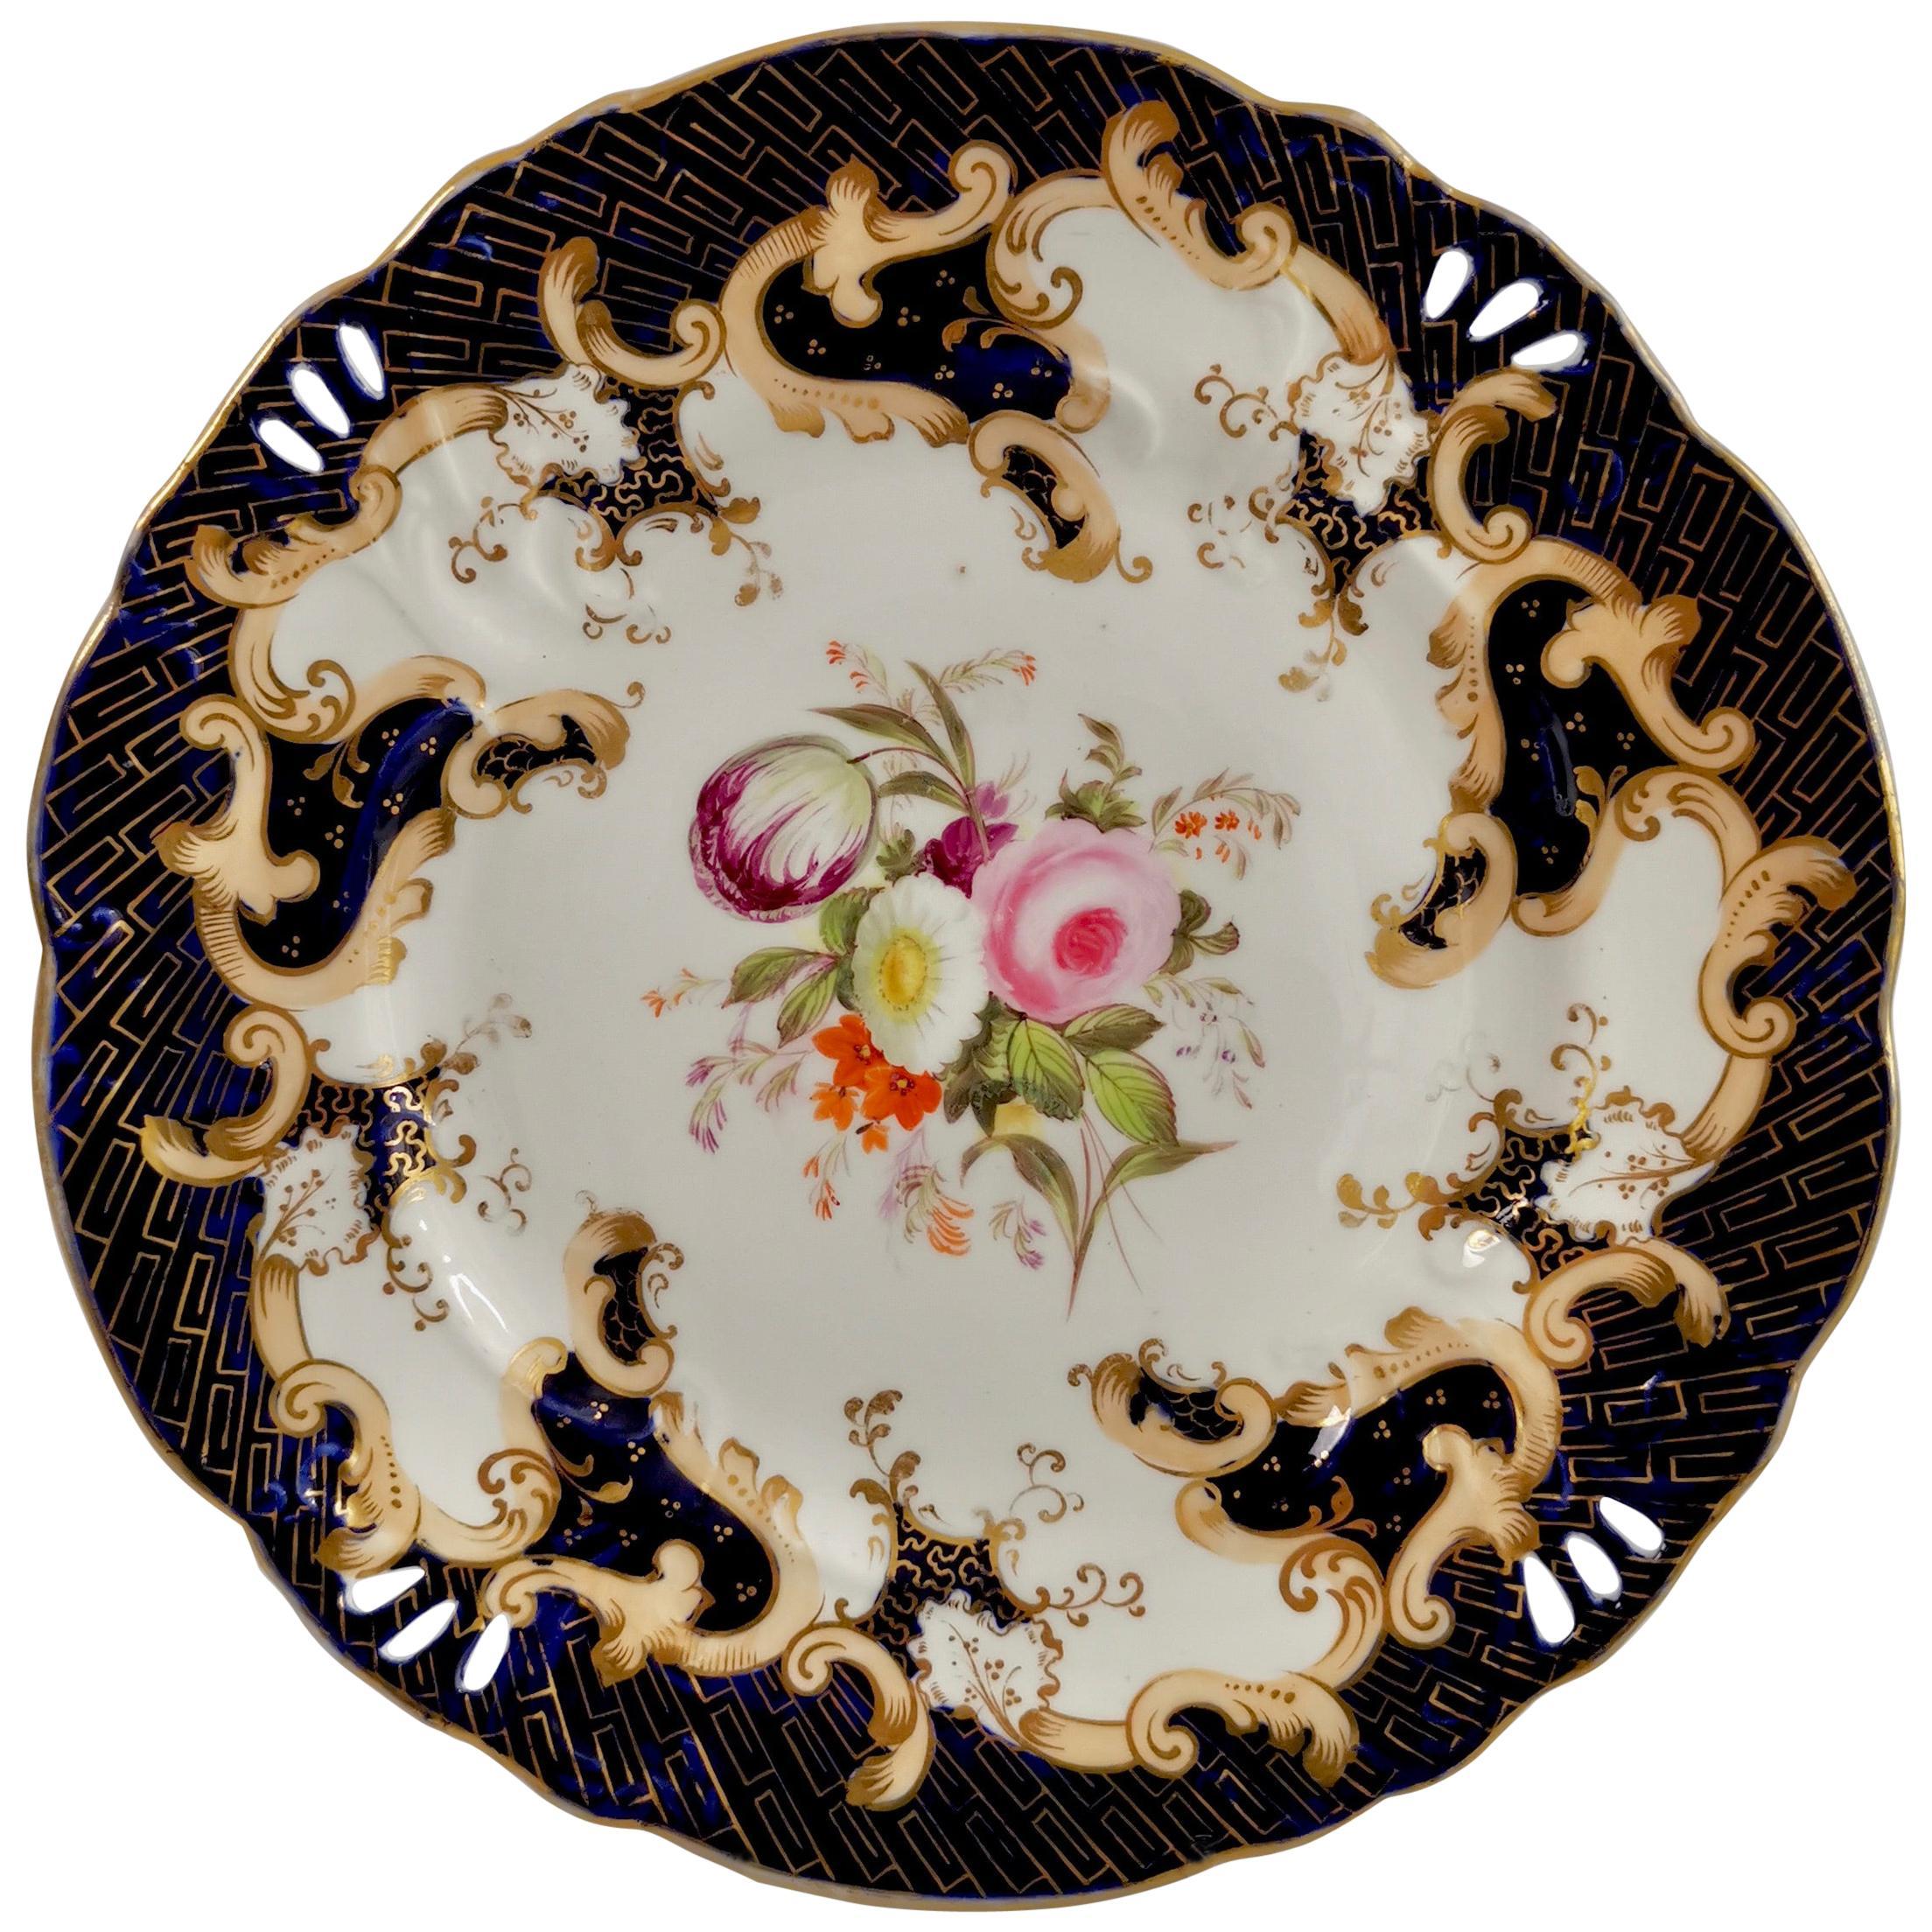 Samuel Alcock Porcelain Plate, Cobalt Blue, Flowers, Rococo Revival ca 1845 '1'